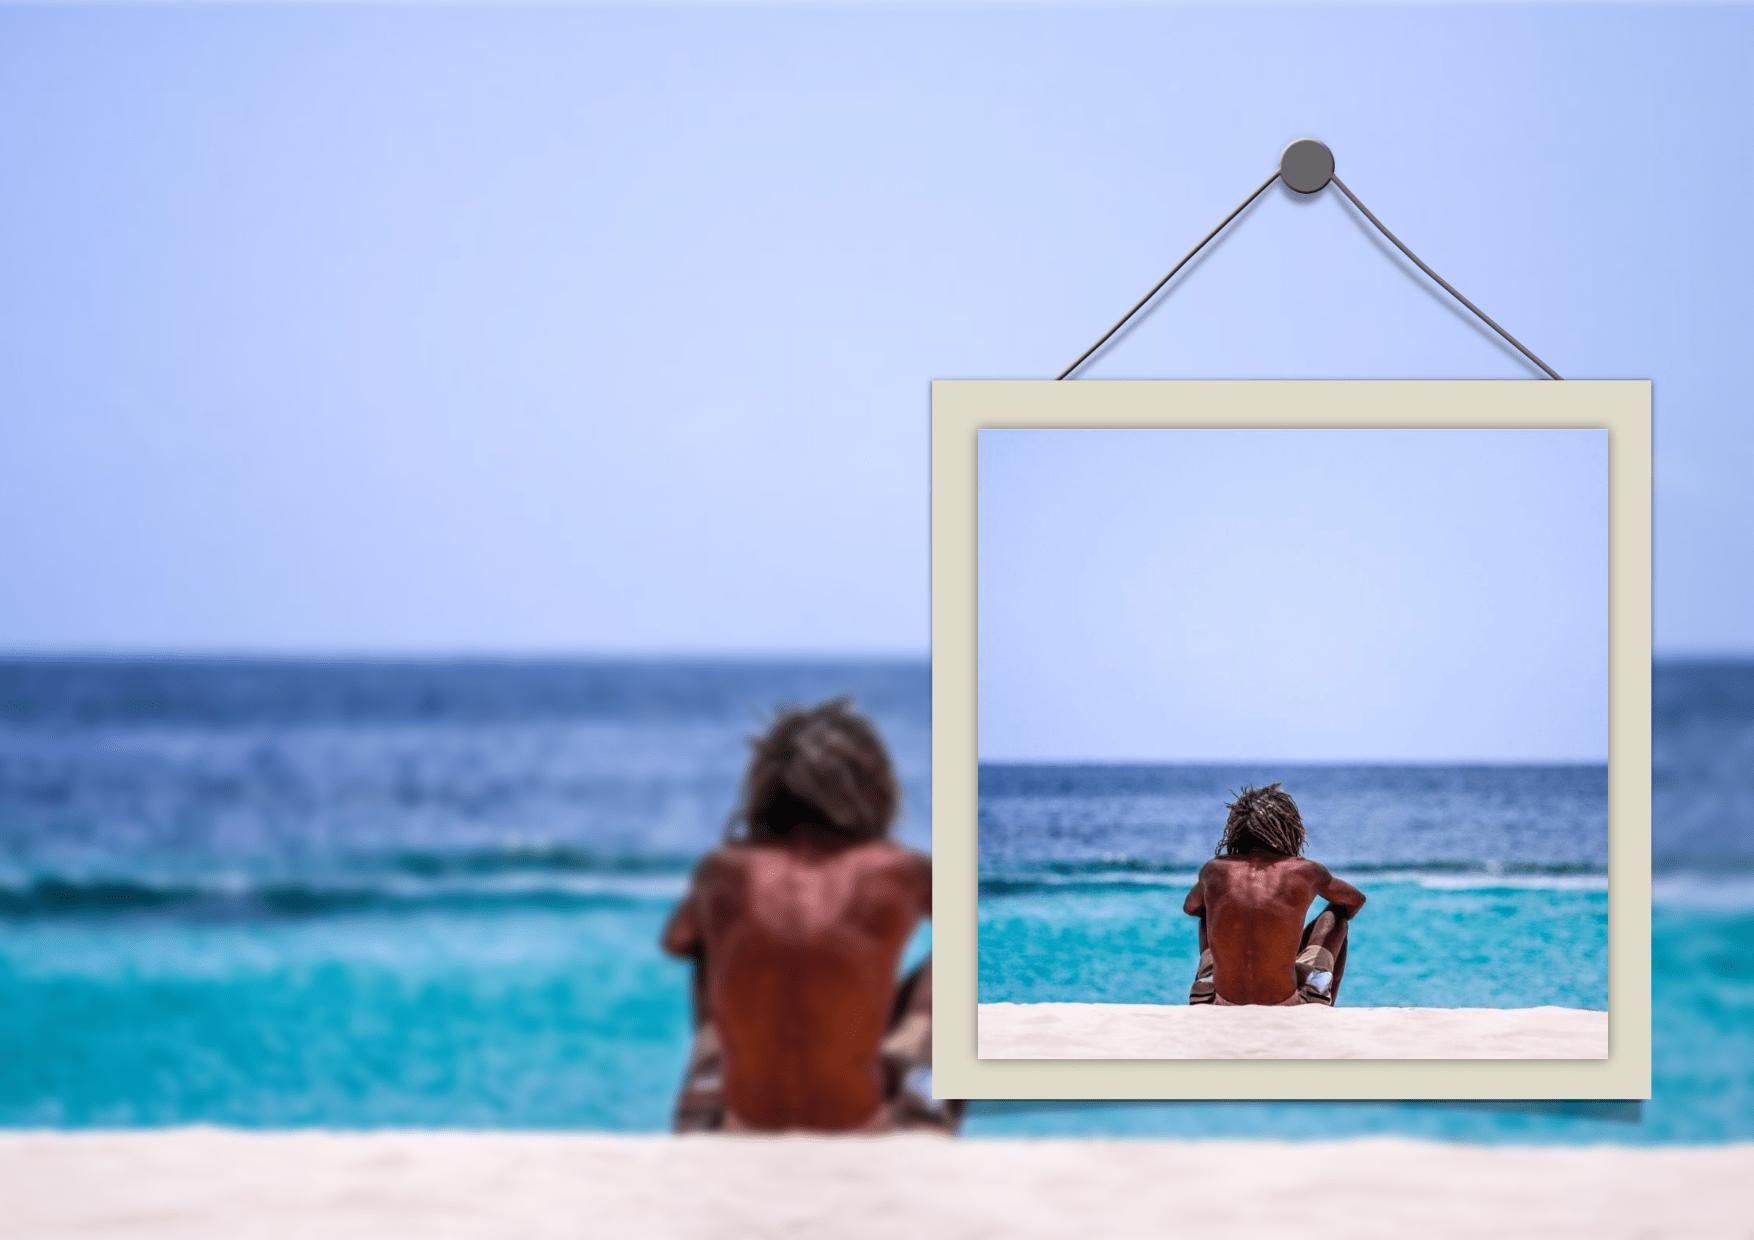 Leisure,                Vacation,                Caribbean,                Product,                Ocean,                Mockup,                Frame,                Image,                Avatar,                White,                Aqua,                 Free Image